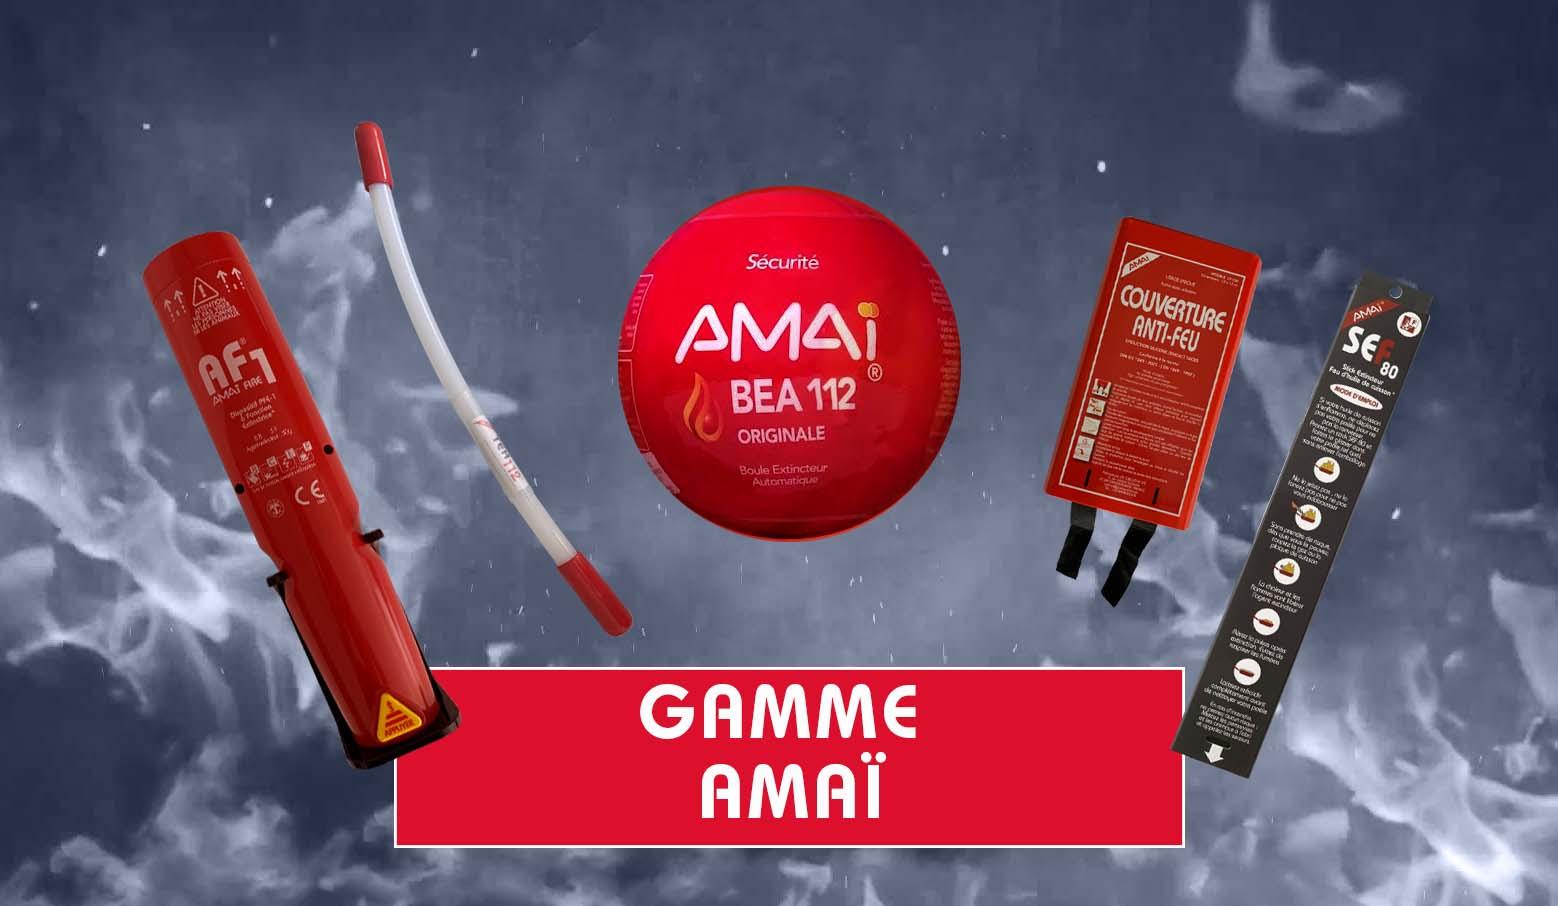 Gamme Amai